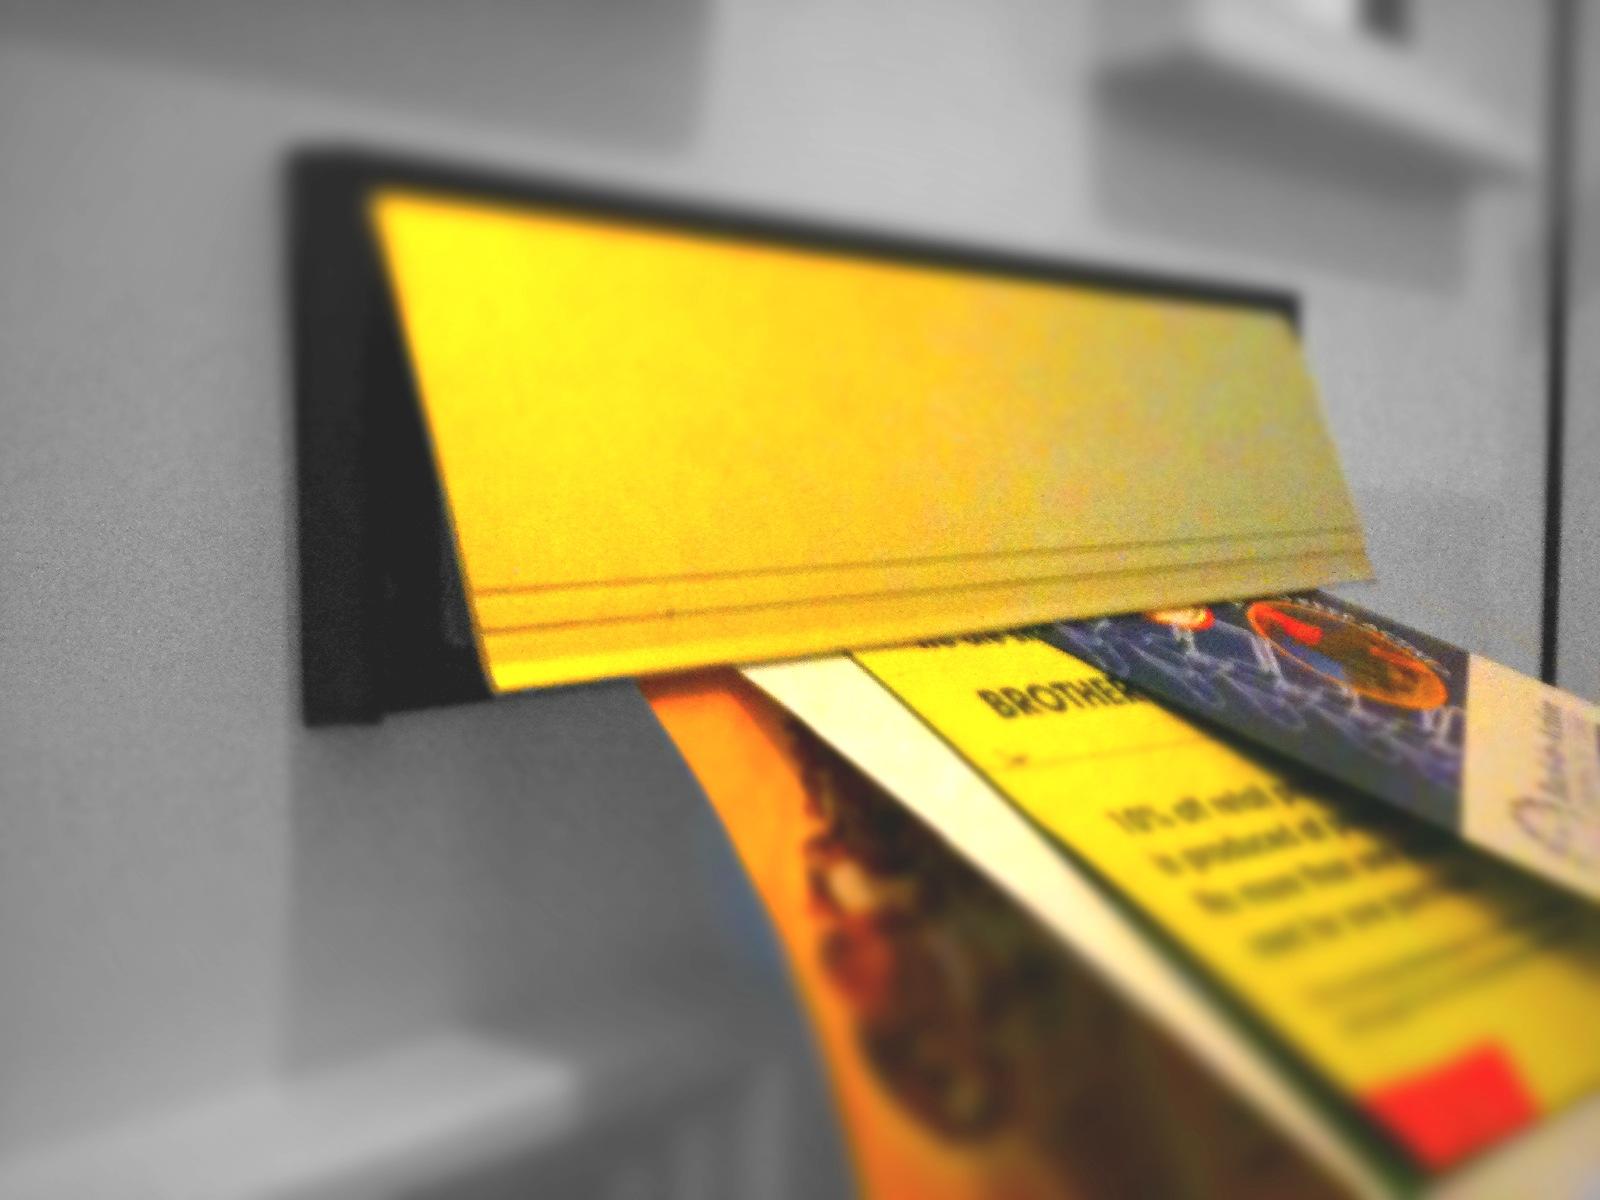 Melbourne Letterbox Distribution